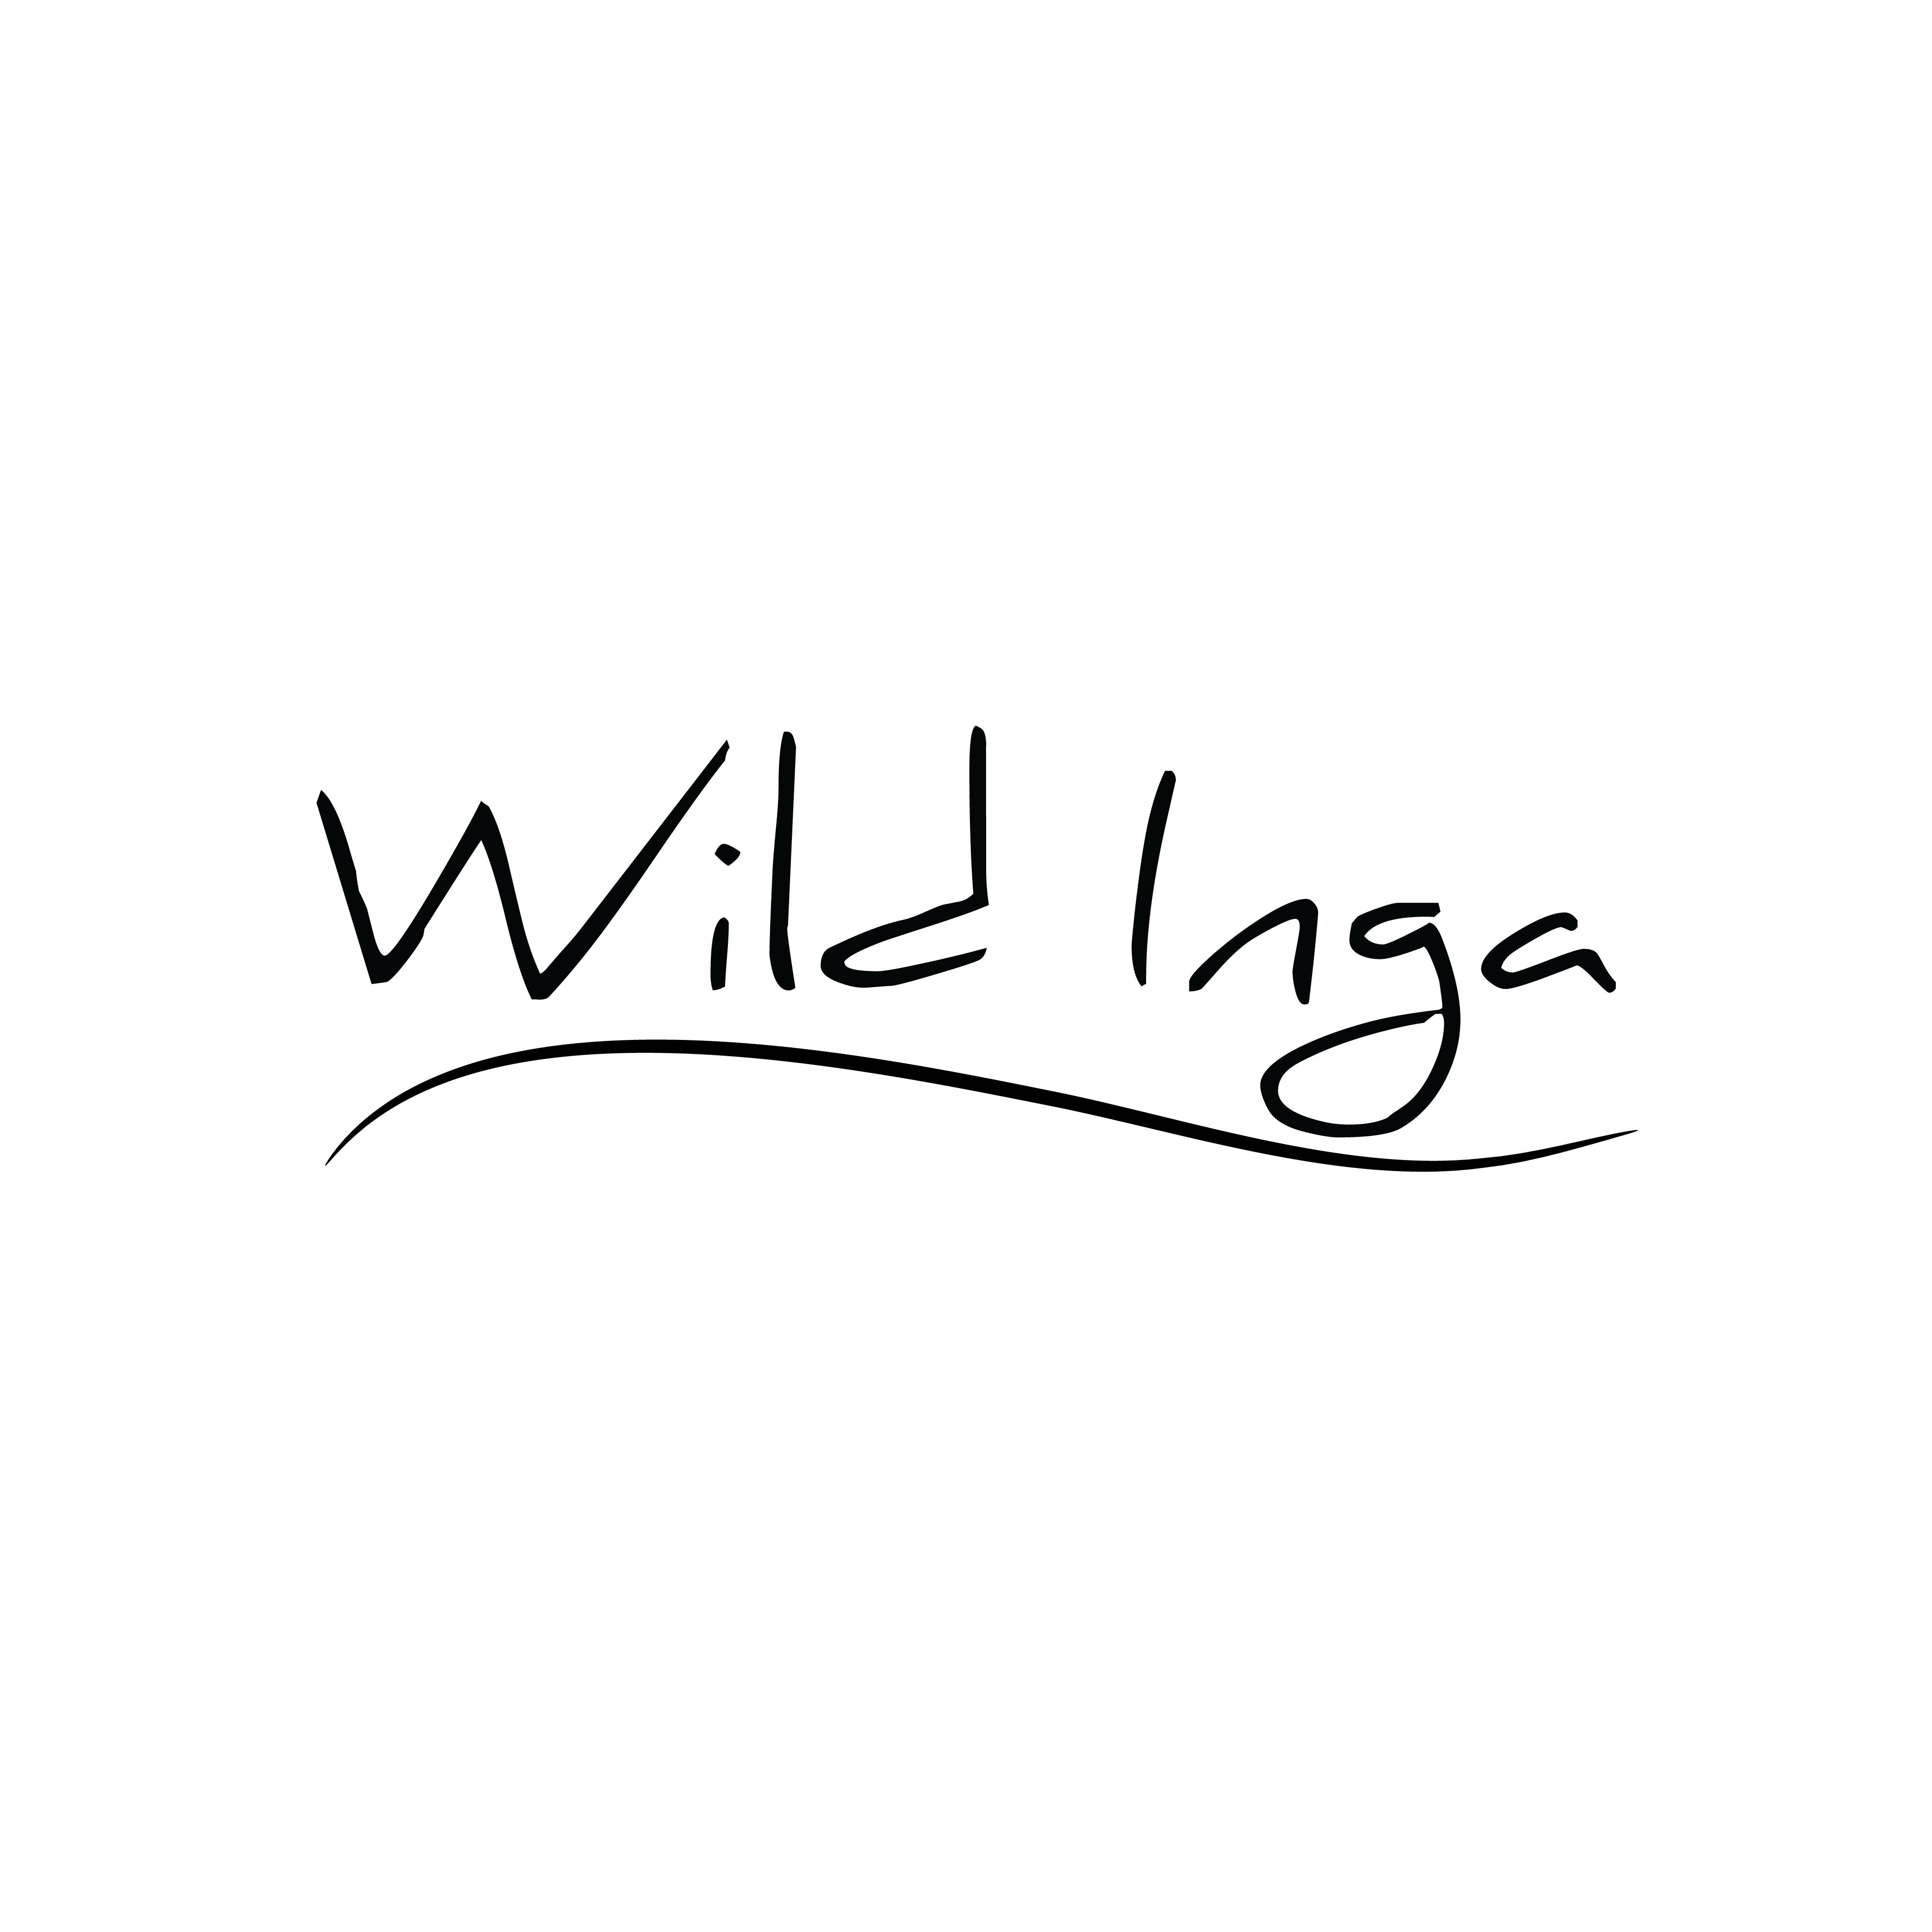 WILD INGA